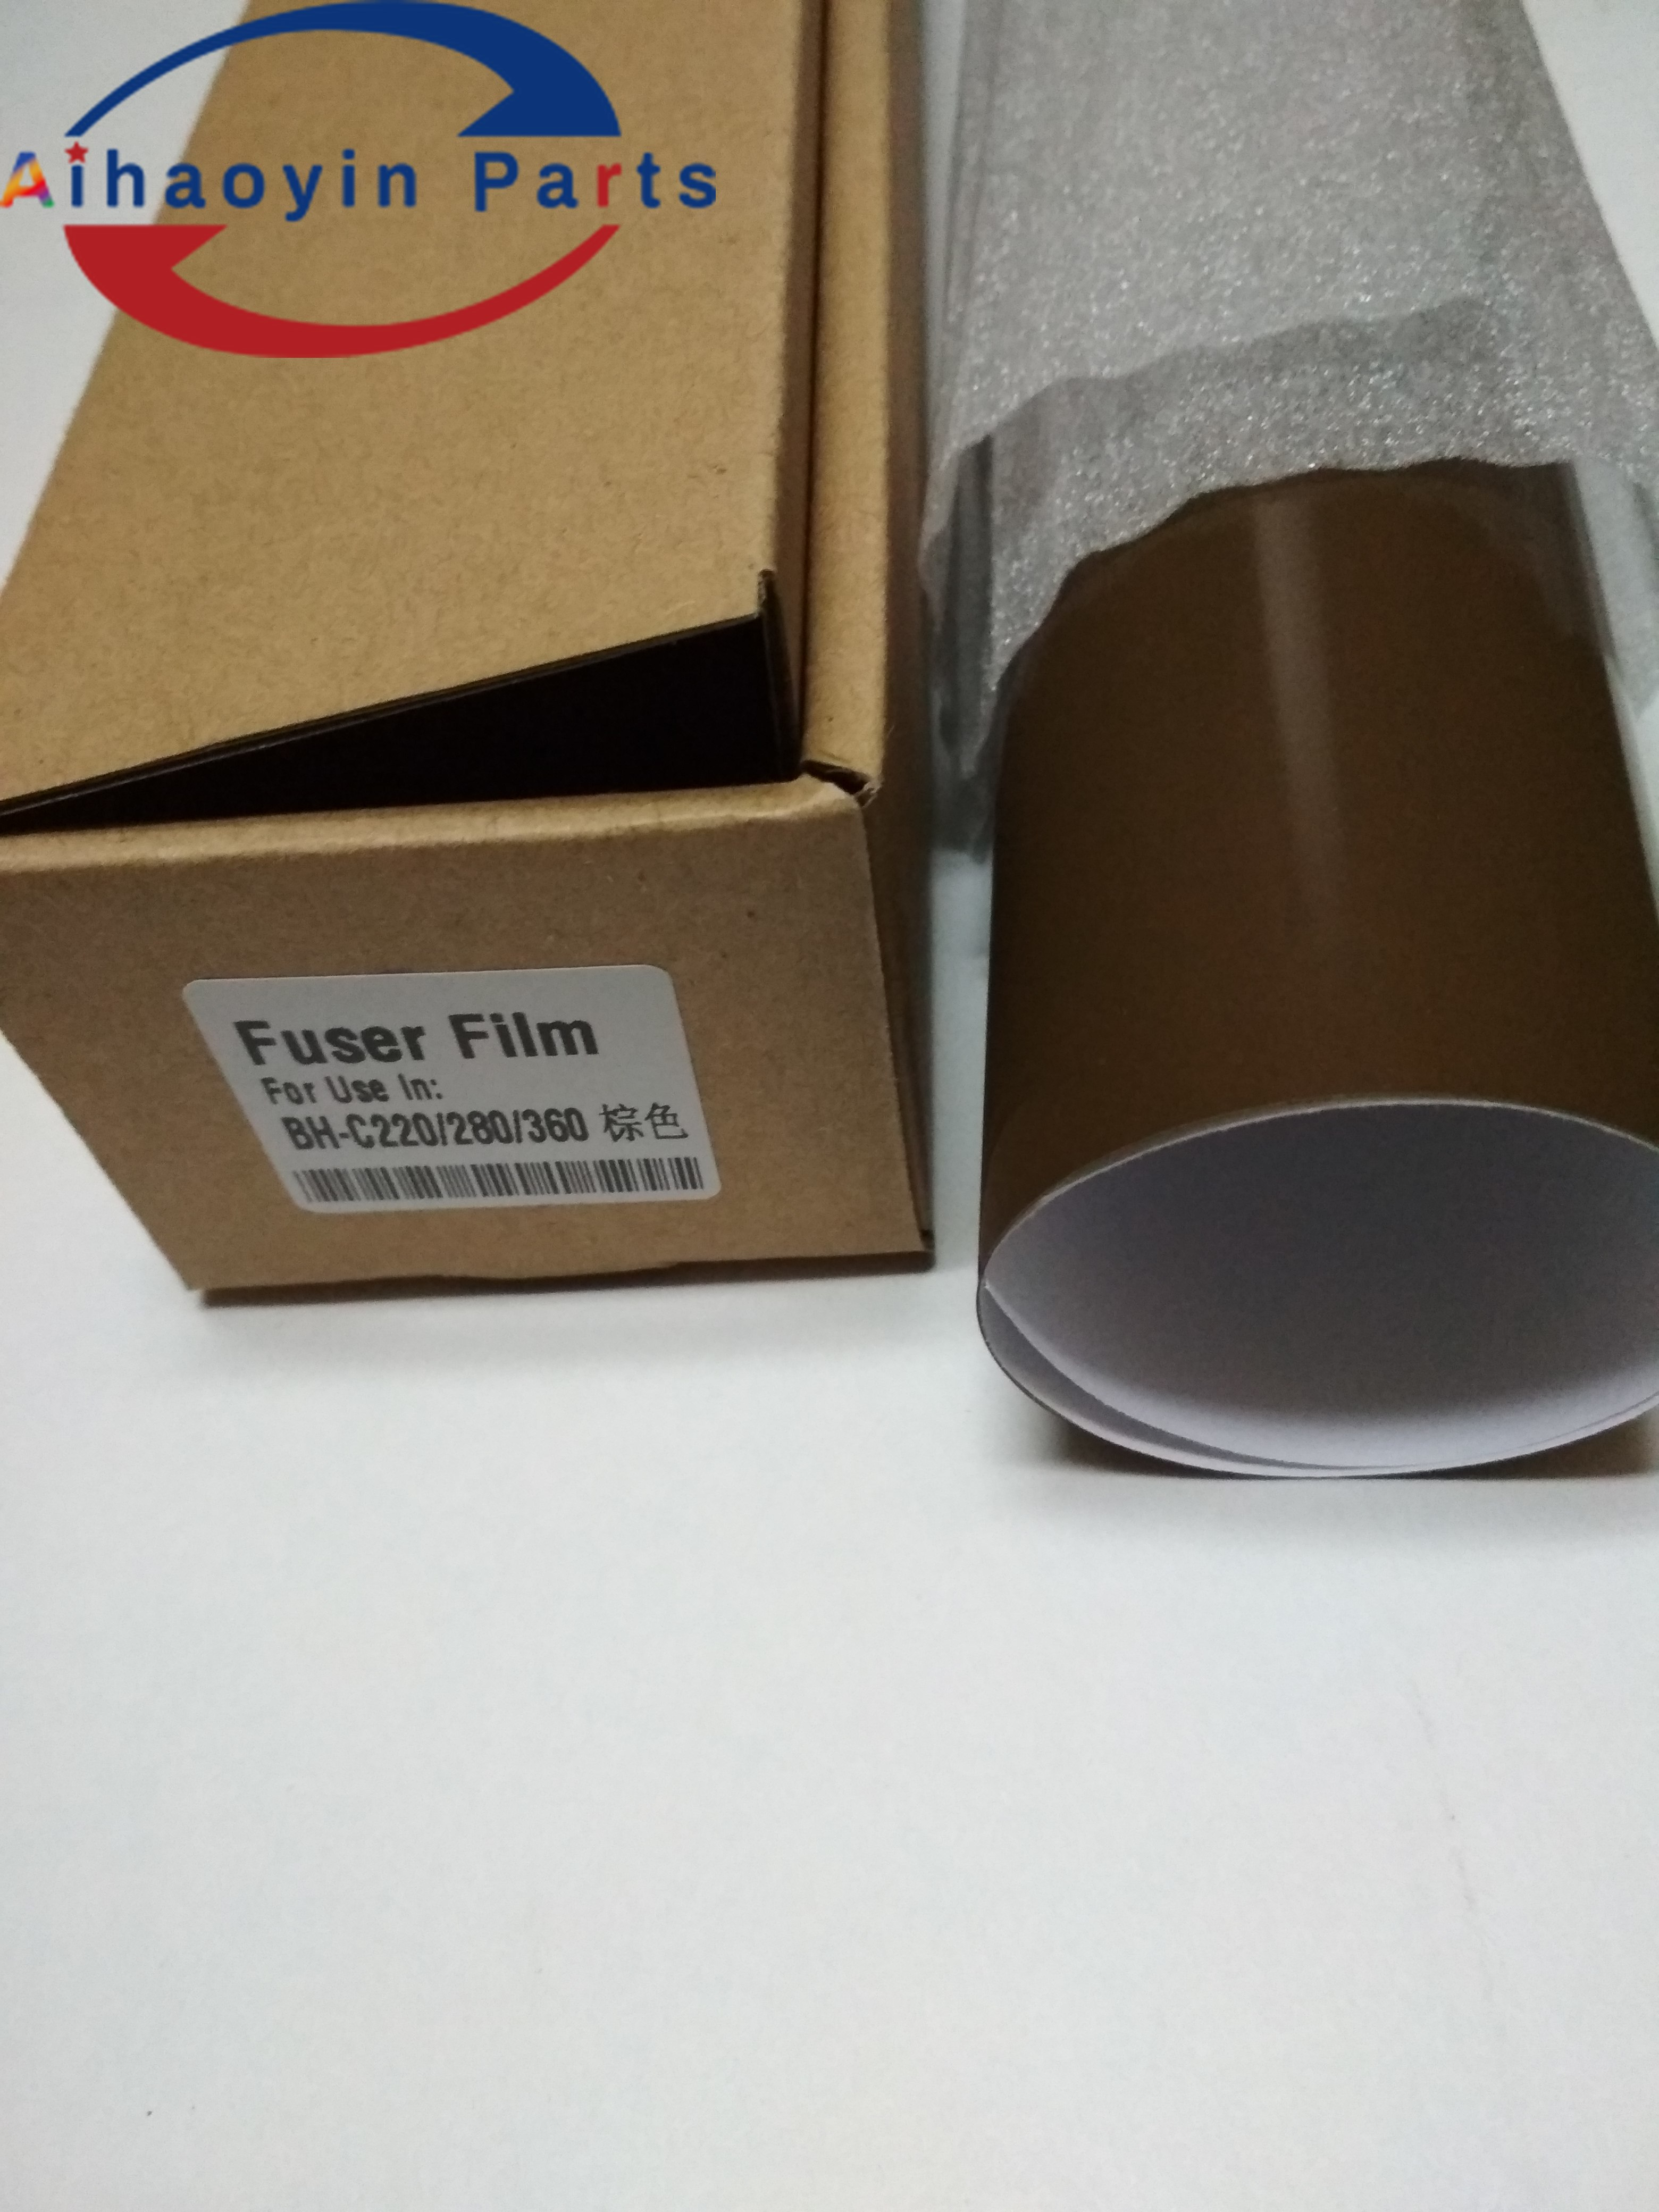 1pc BHC220 Japan Compatible Fuser Film Belt Replacement for Konica Minolta Bizhub C220 C280 C360 C224 C284 C364 C454 C224e C308|Printer Parts| |  - title=